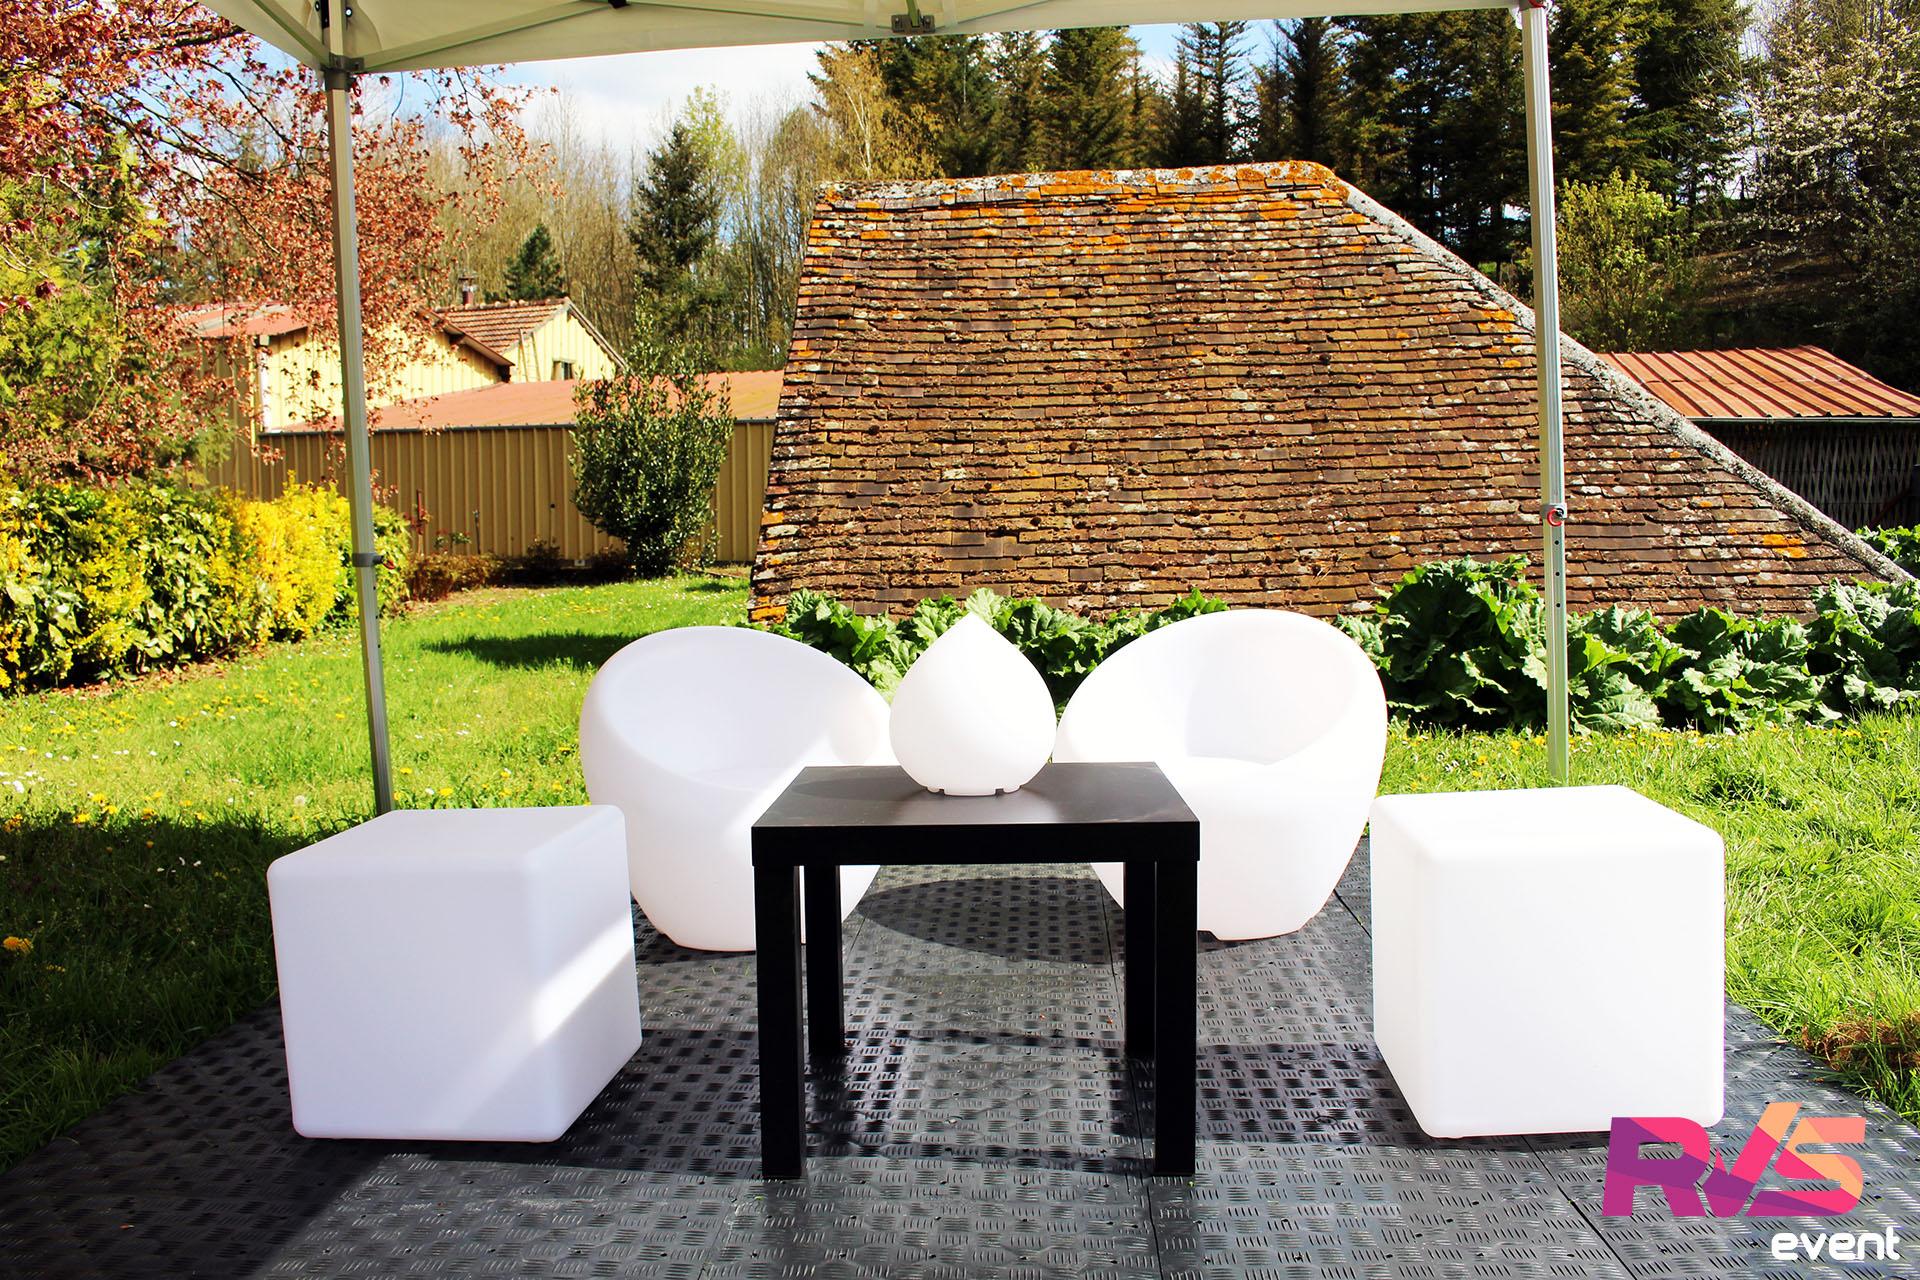 Cubes lumineux & Fauteuils lumineux & Tables & Boules lumineuses & Gouttes lumineuses & Sol PVC - RVS Event